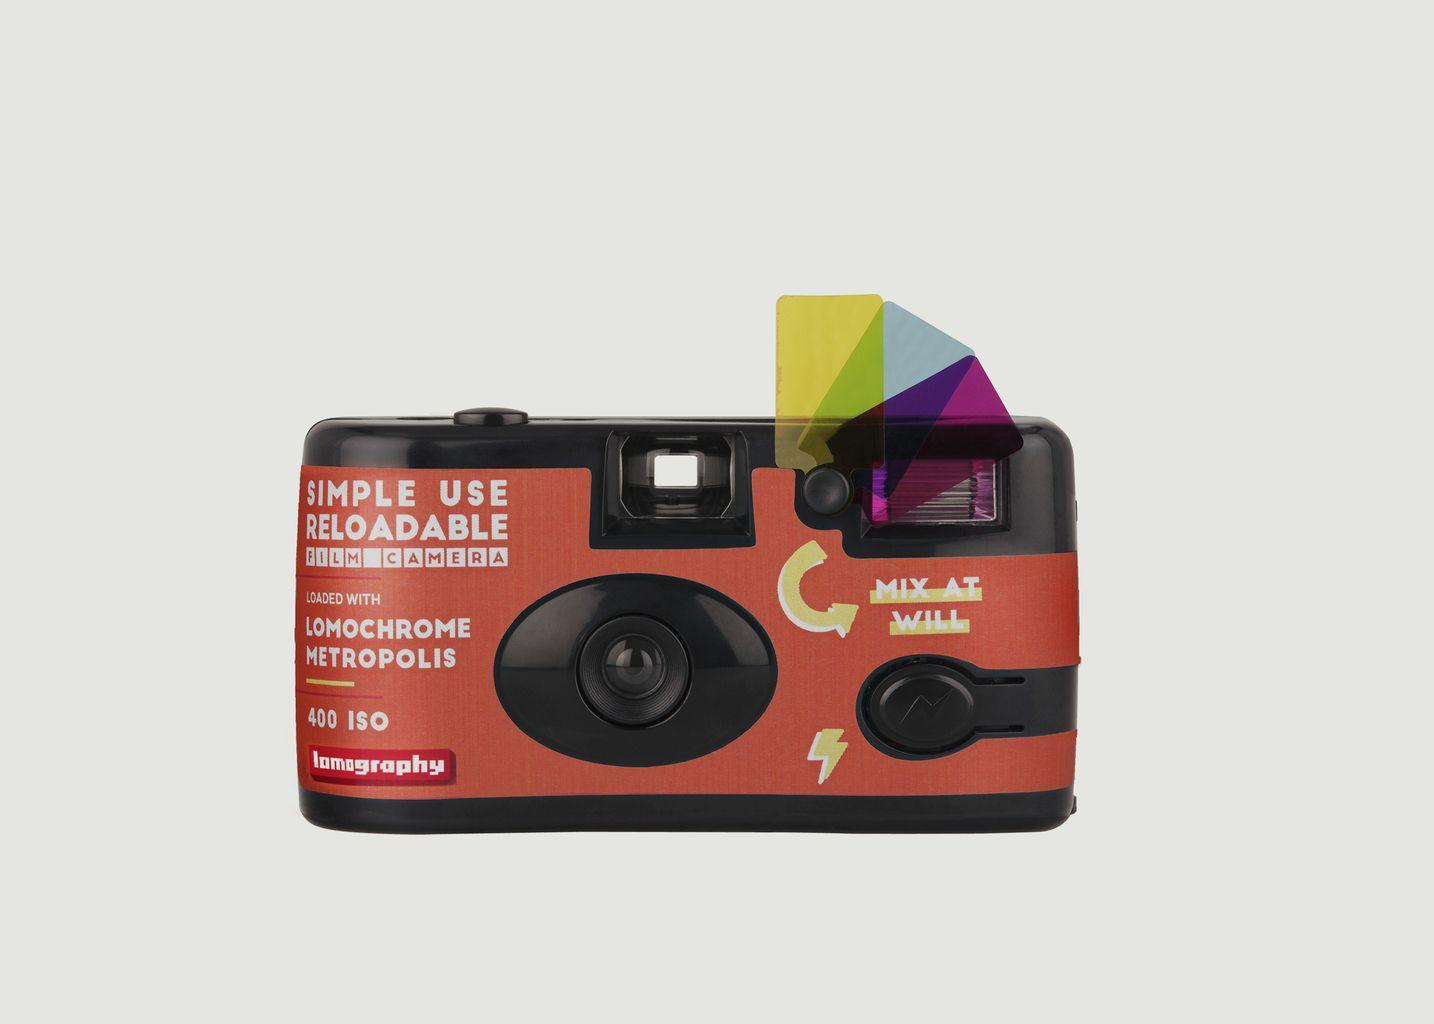 Simple Use Camera 400/27 Metropolis - Lomography